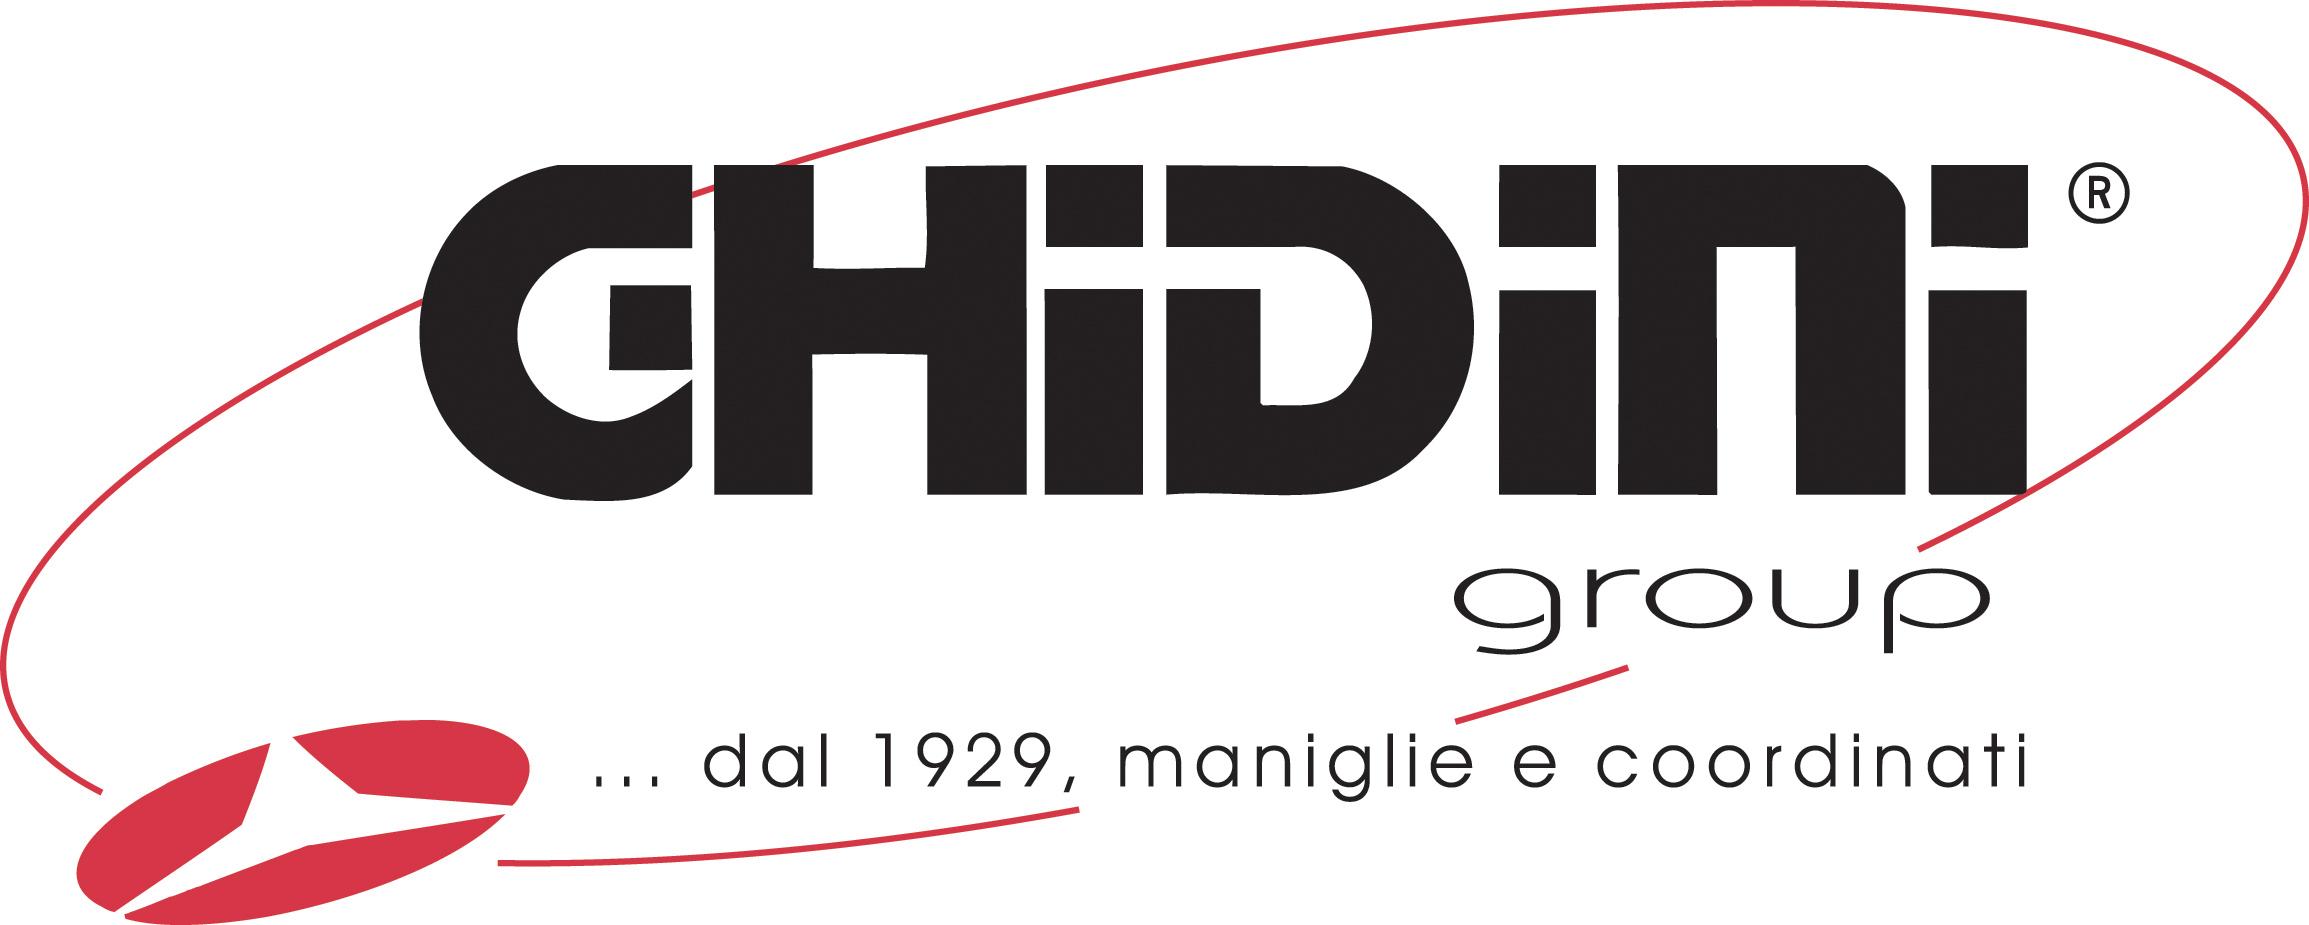 Ghidini / Rossetti